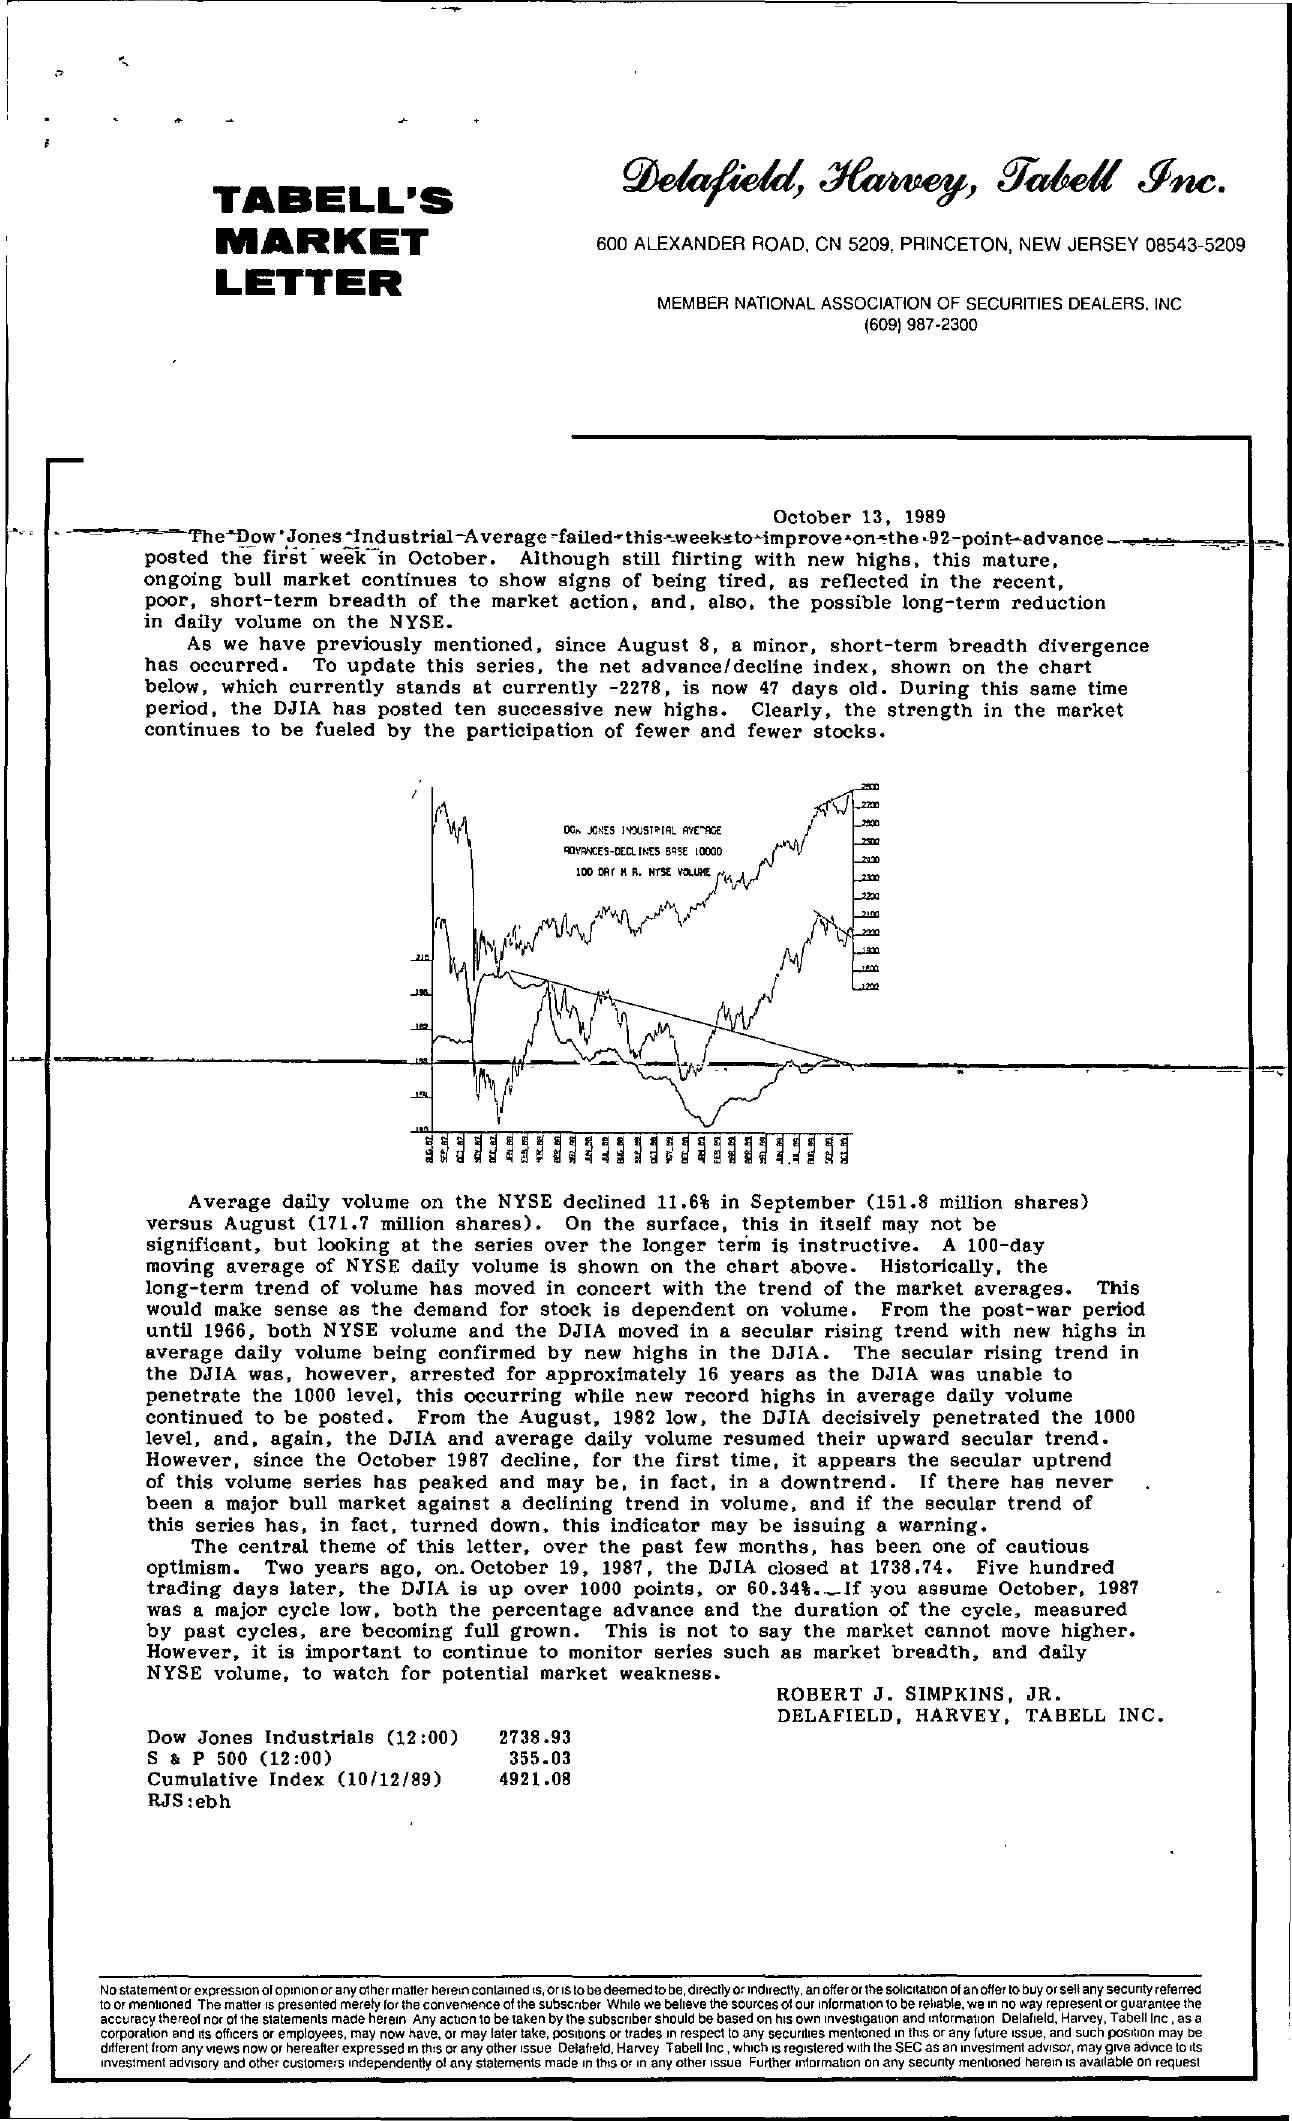 Tabell's Market Letter - October 13, 1989